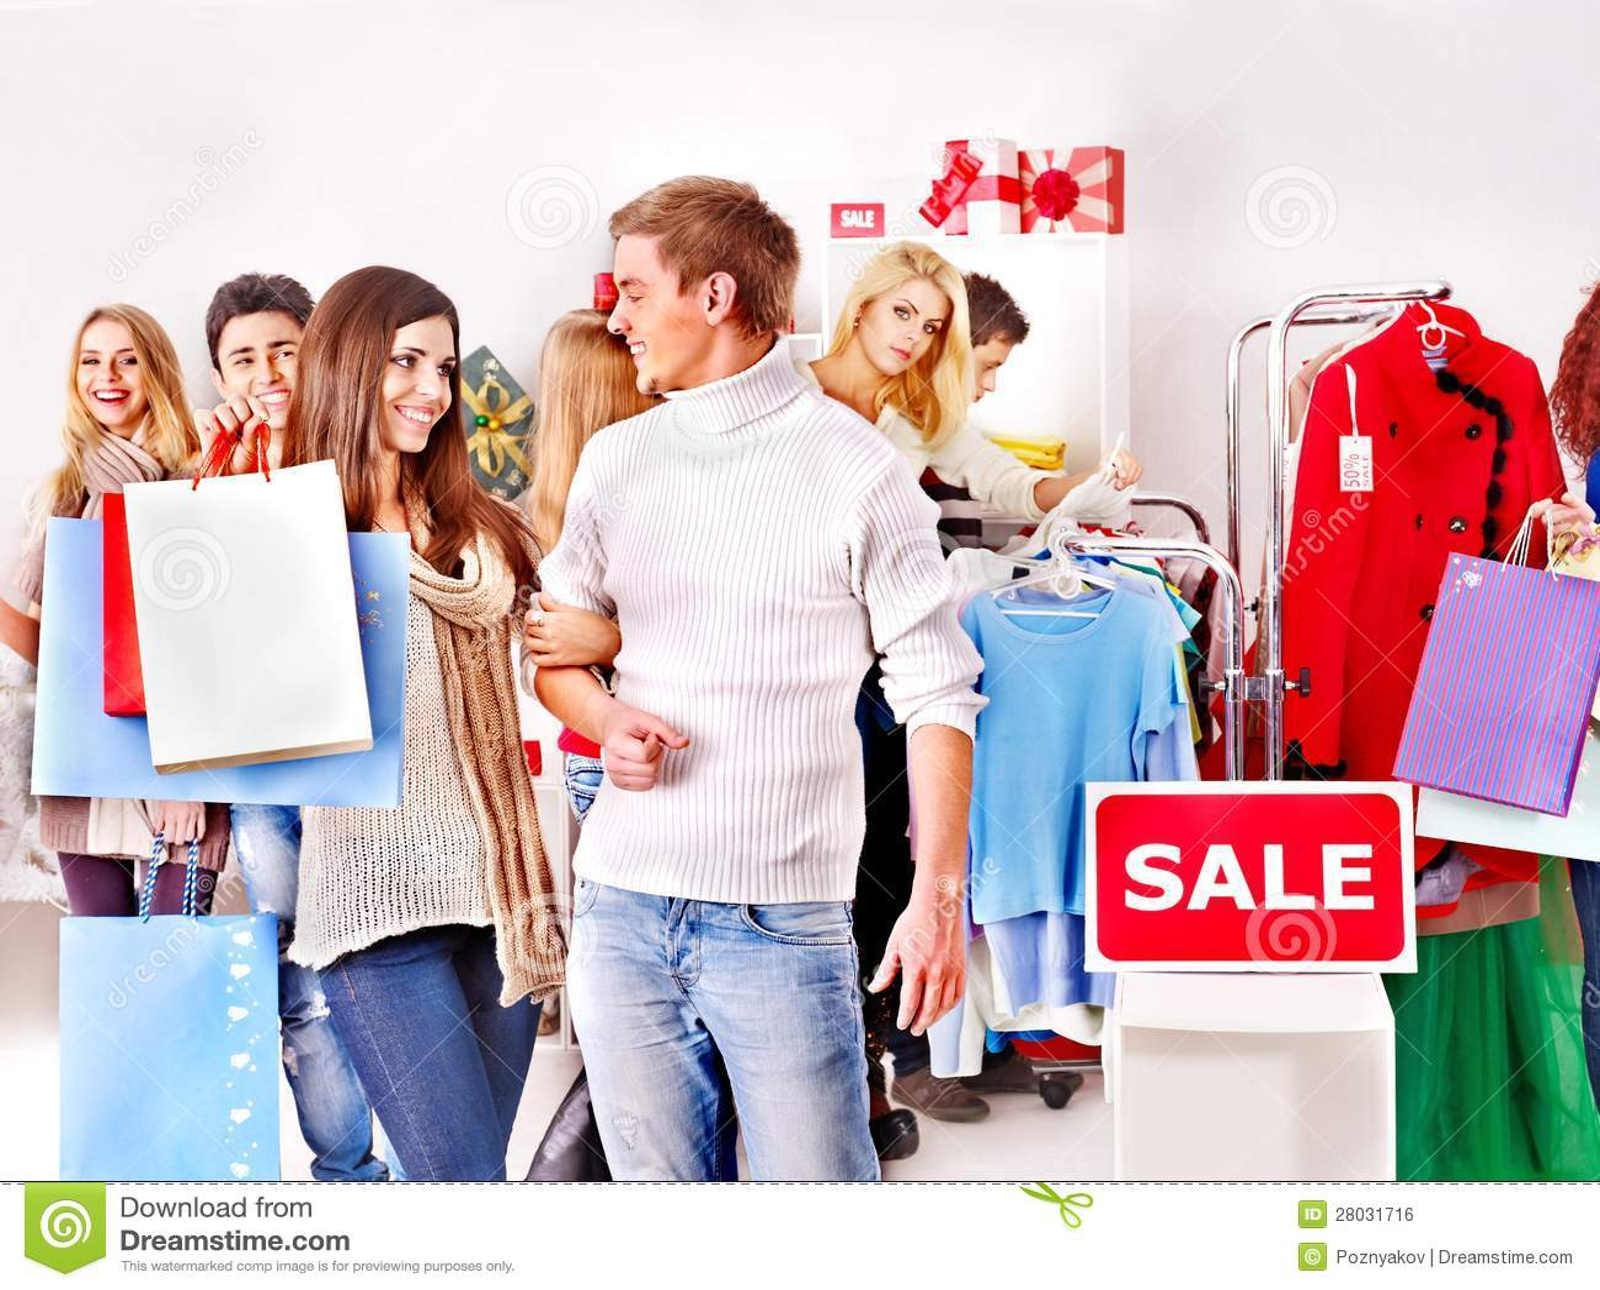 Shopping Women At Christmas Sales Royalty Free Stock